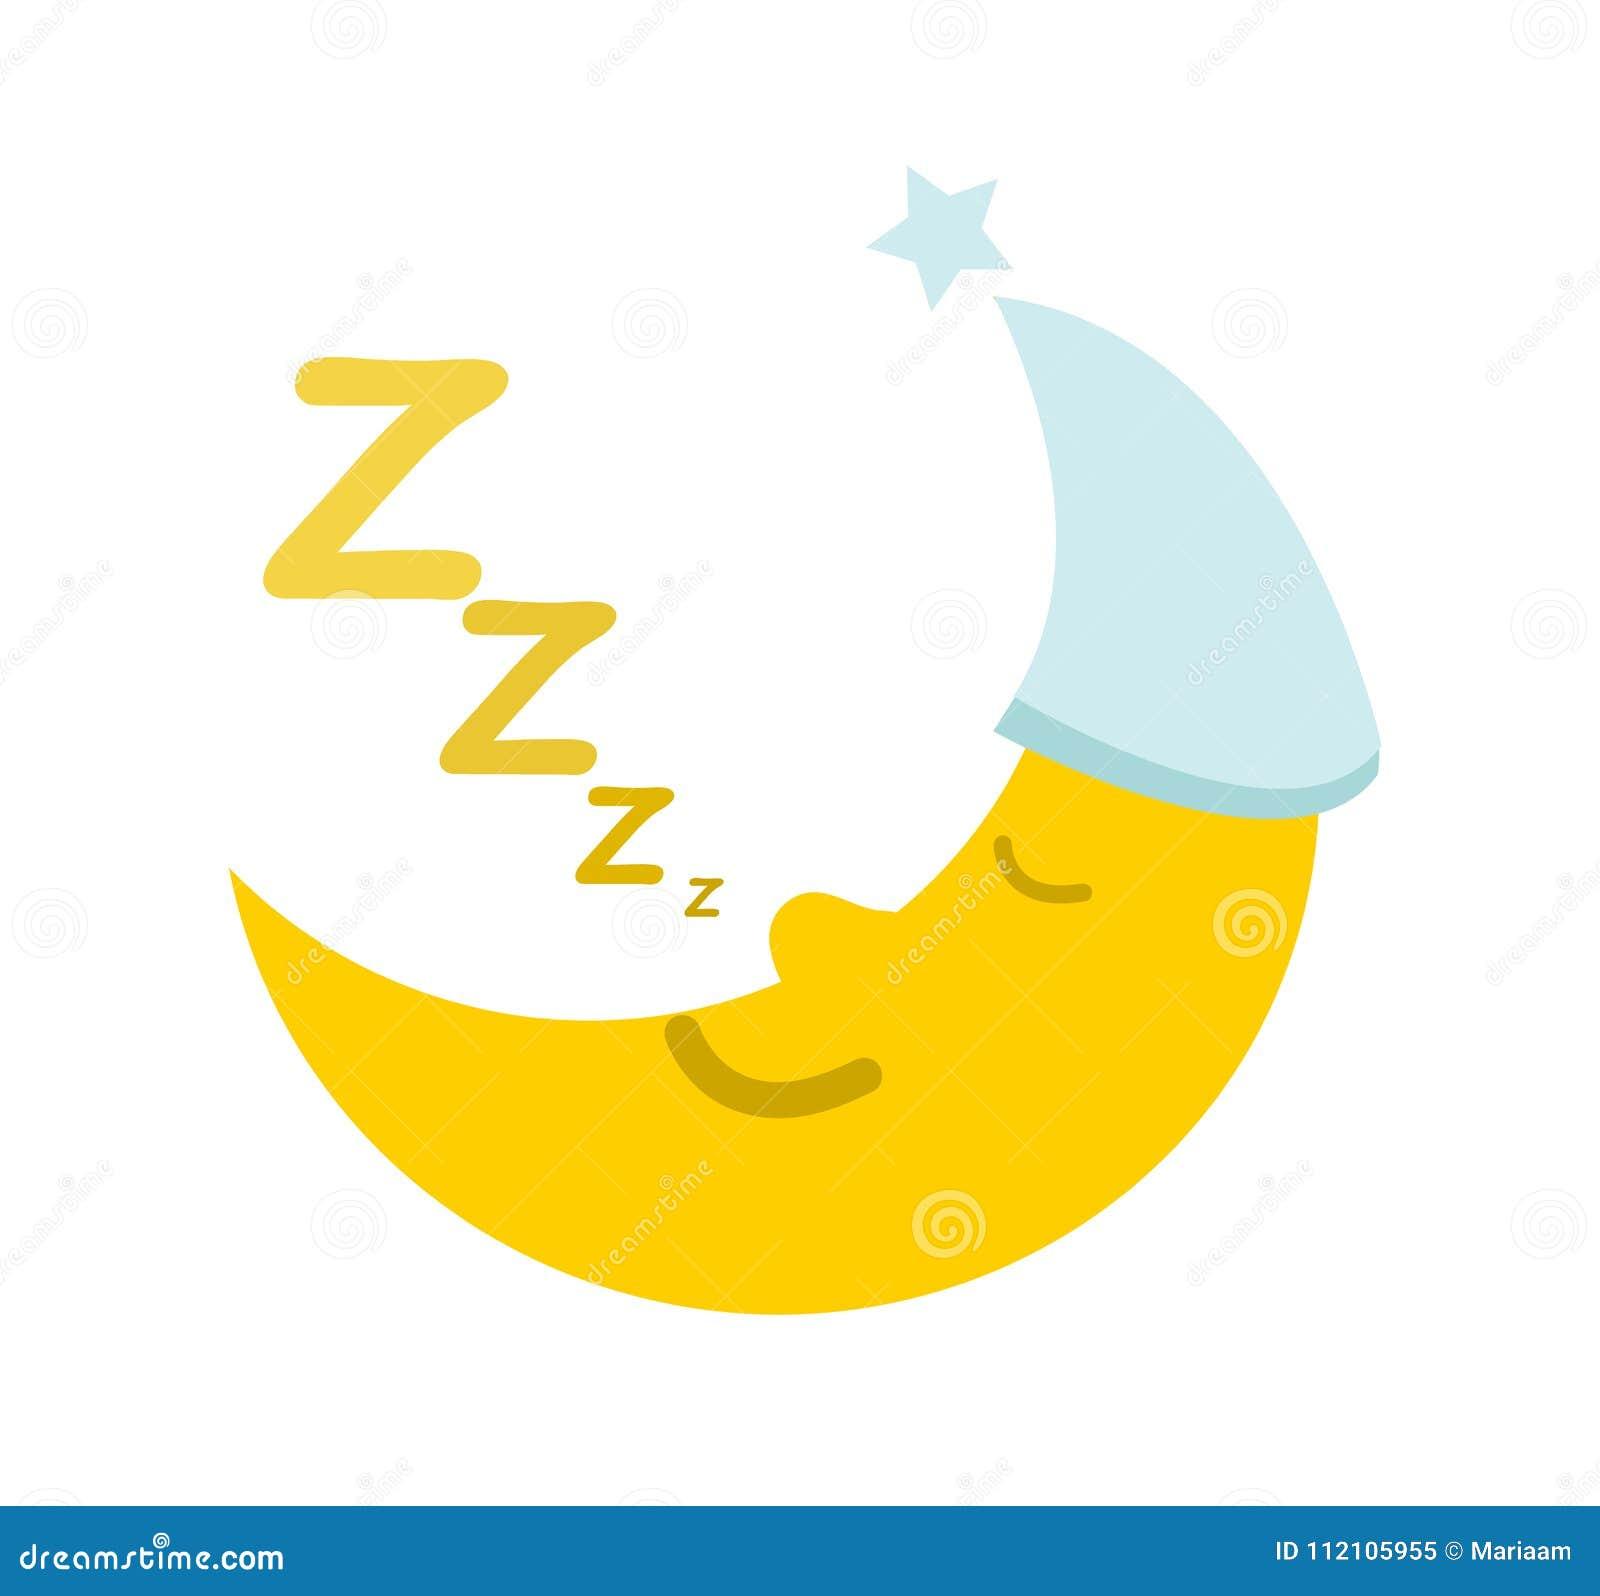 Sleepyhead Cartoons Illustrations Amp Vector Stock Images